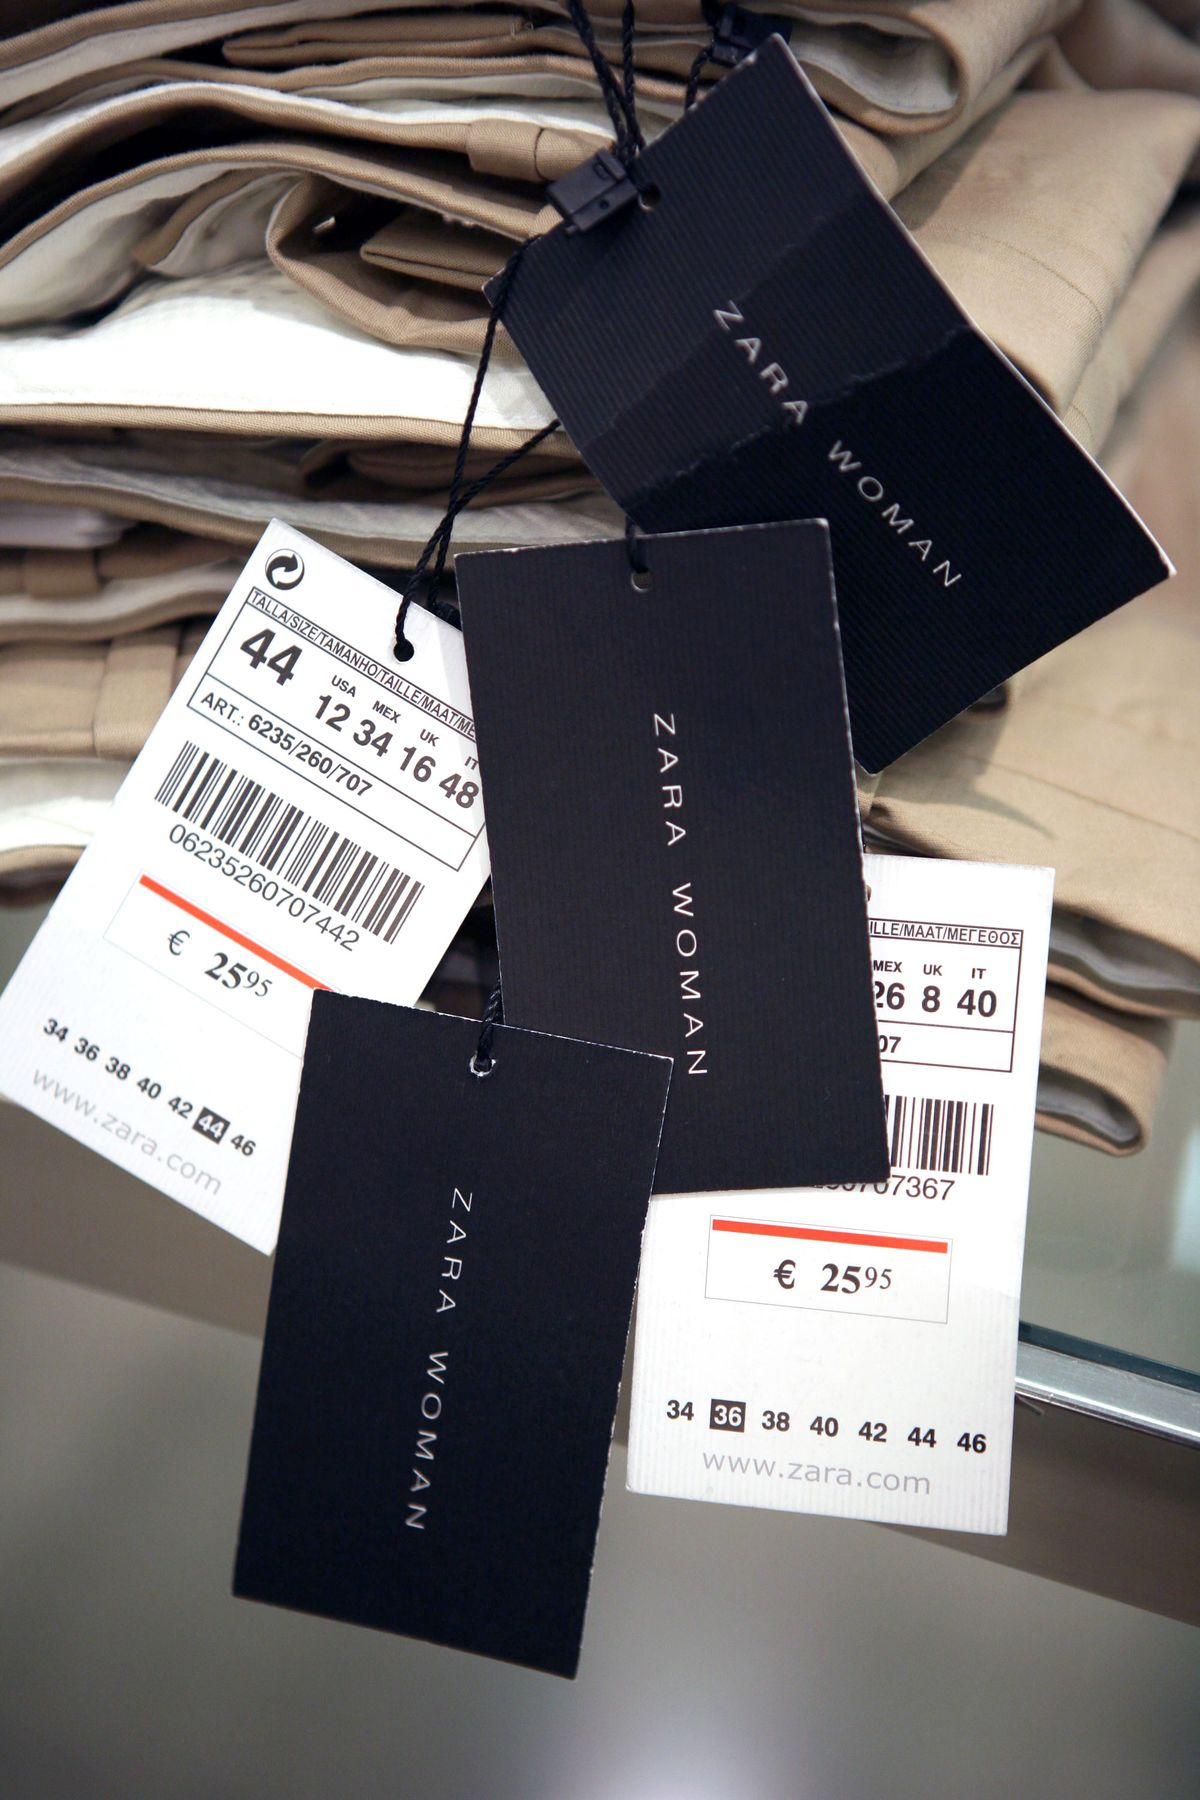 Turkish Lira's Plunge Brings Cost Relief for Zara Owner Inditex